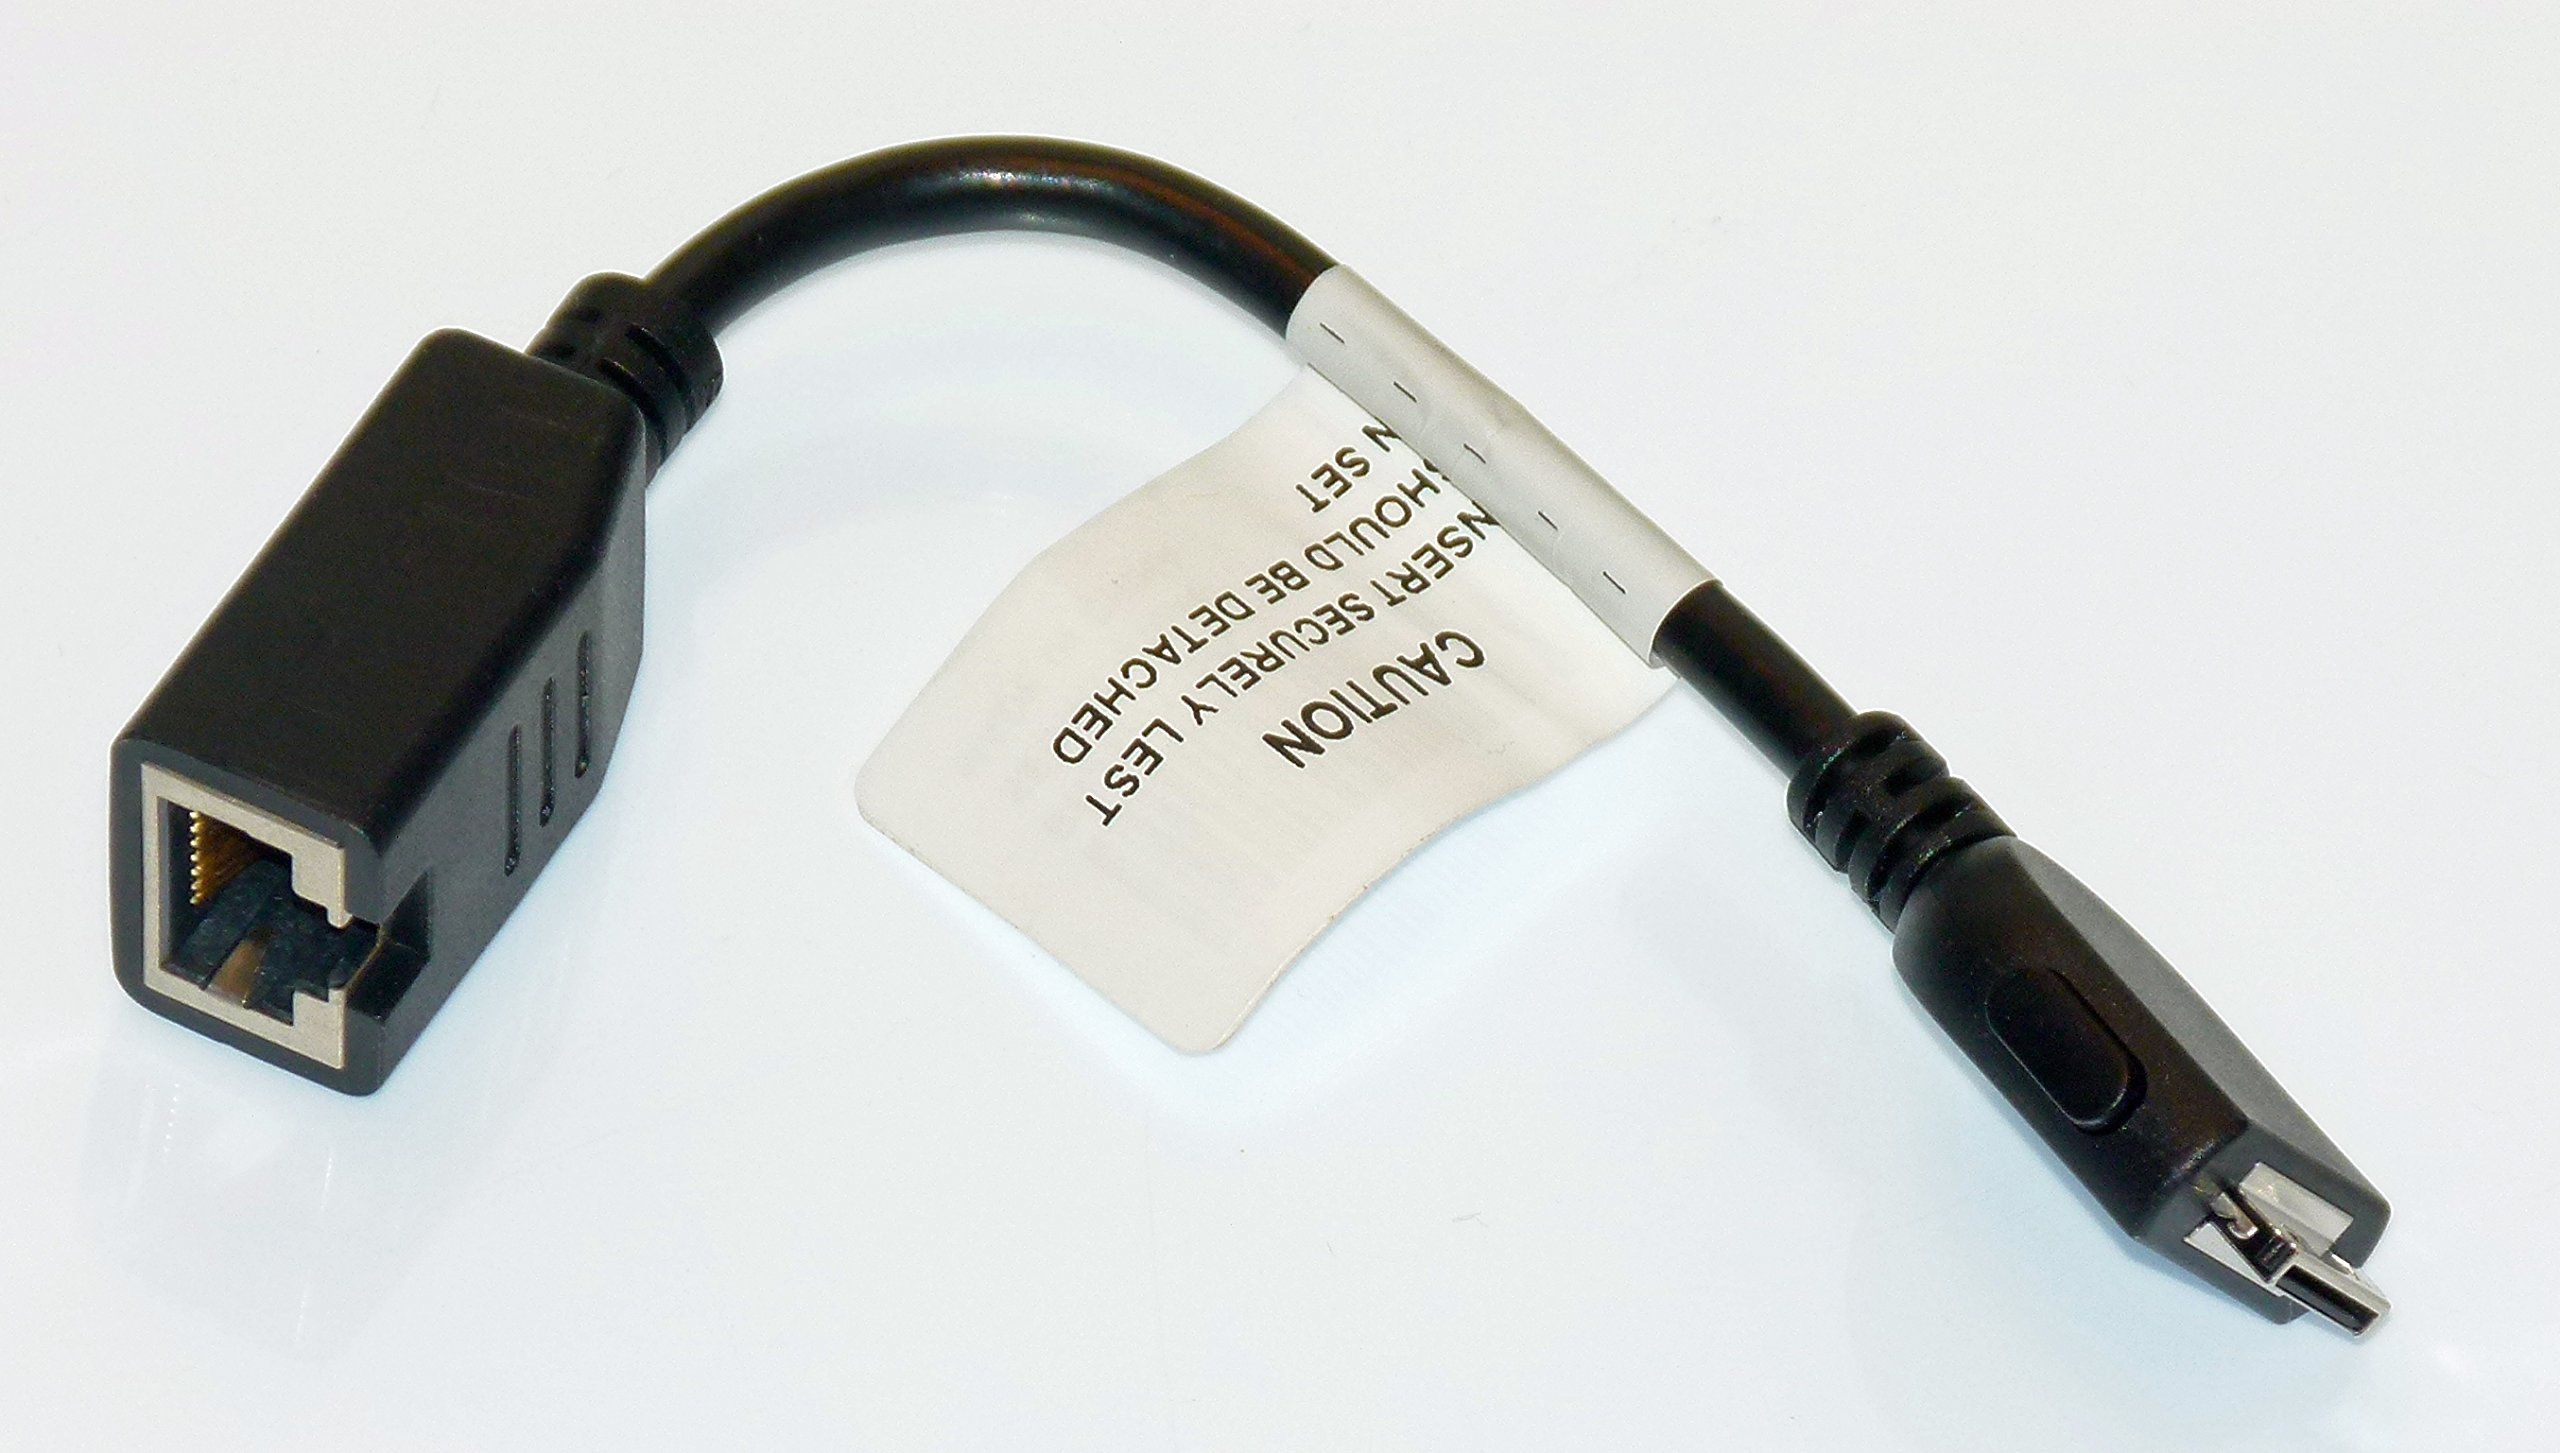 Samsung LAN Adapter Cable - NOT A Generic! UN65C8000XF, UN40C9090ZW, UN46C8000XF, UN40C7000WF